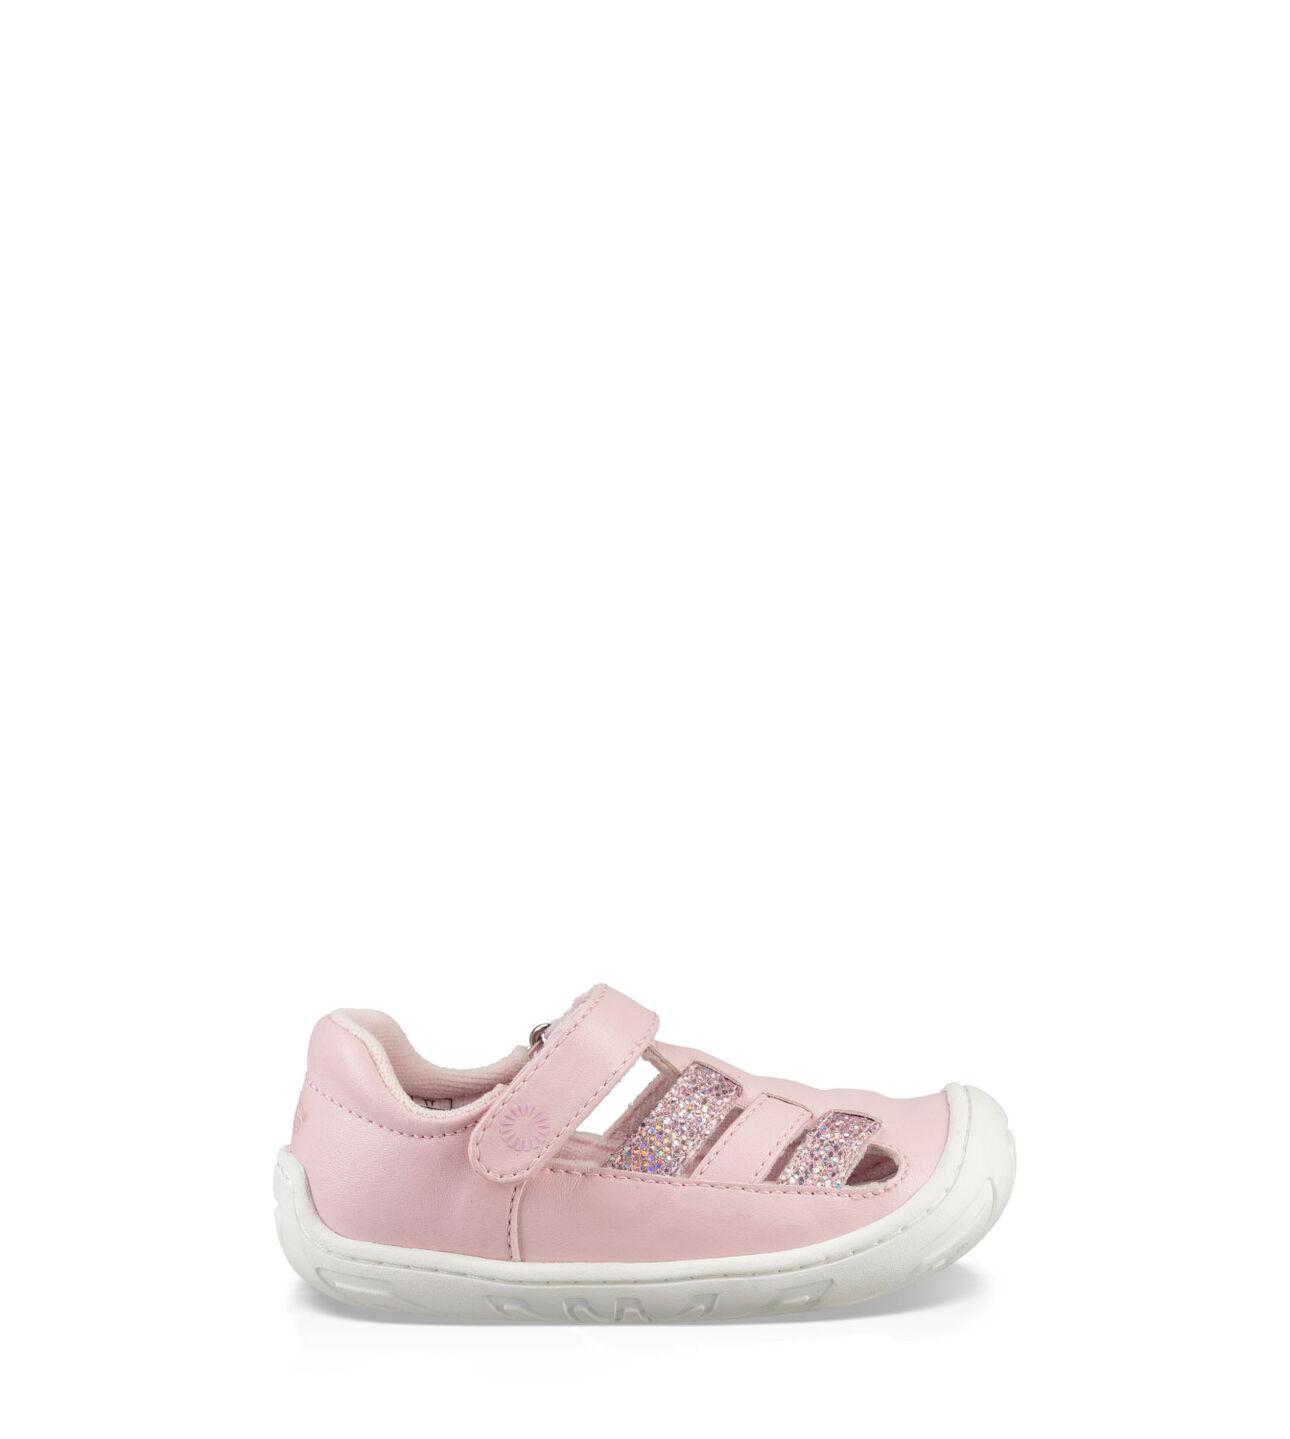 668598db610 Santore Sparkles Sandal